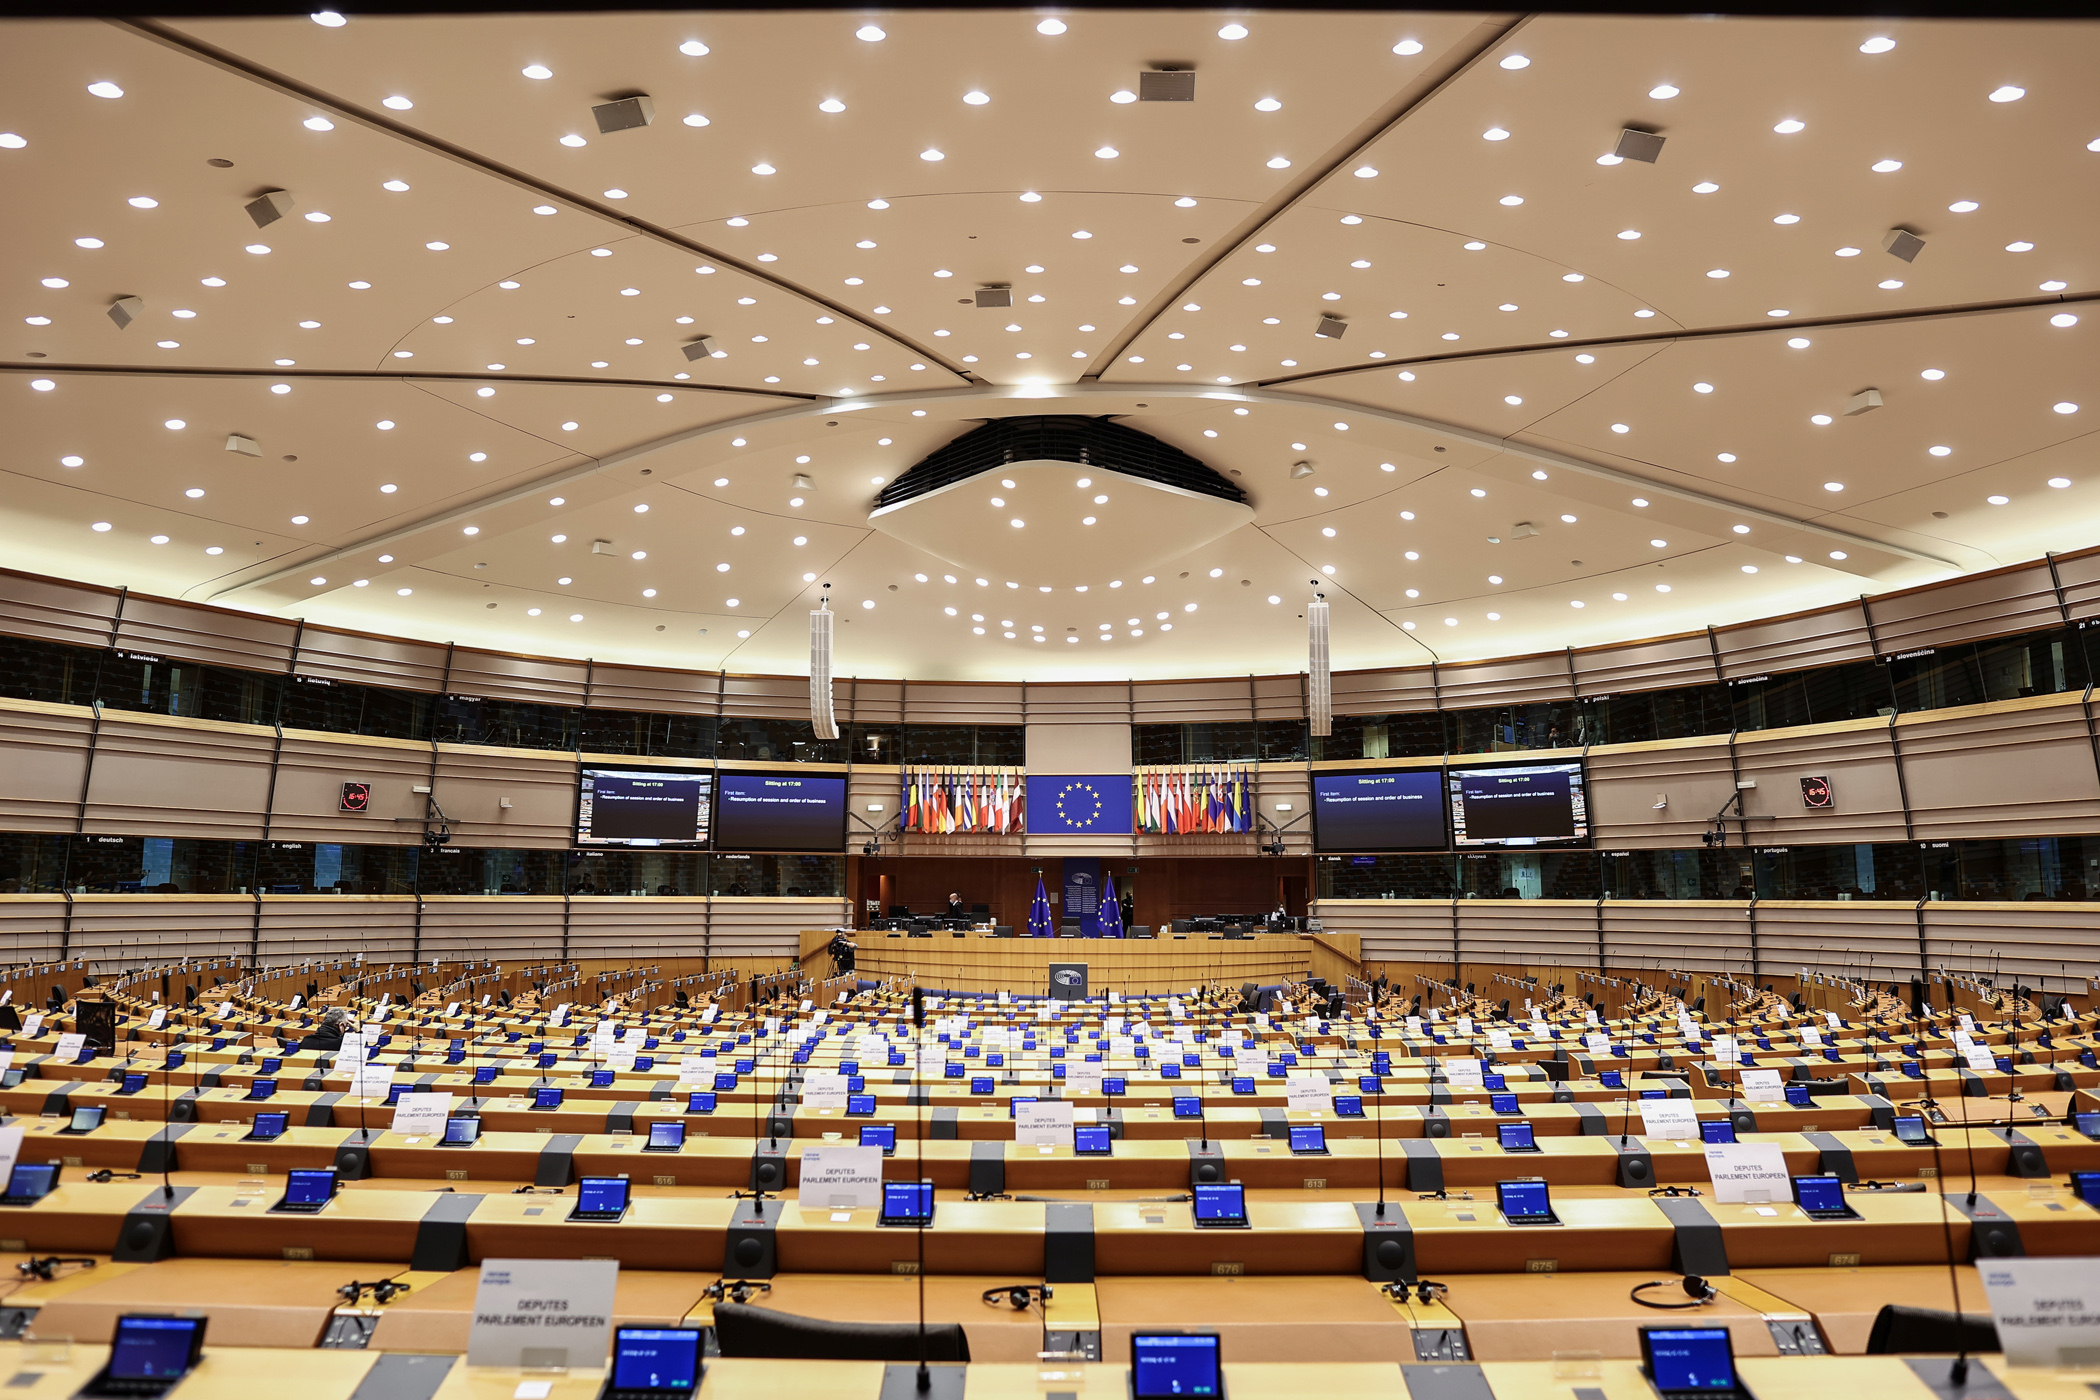 To Ευρωπαϊκό Κοινοβούλιο αρνείται να επικυρώσει τη συμφωνία της Ένωσης με την Κίνα